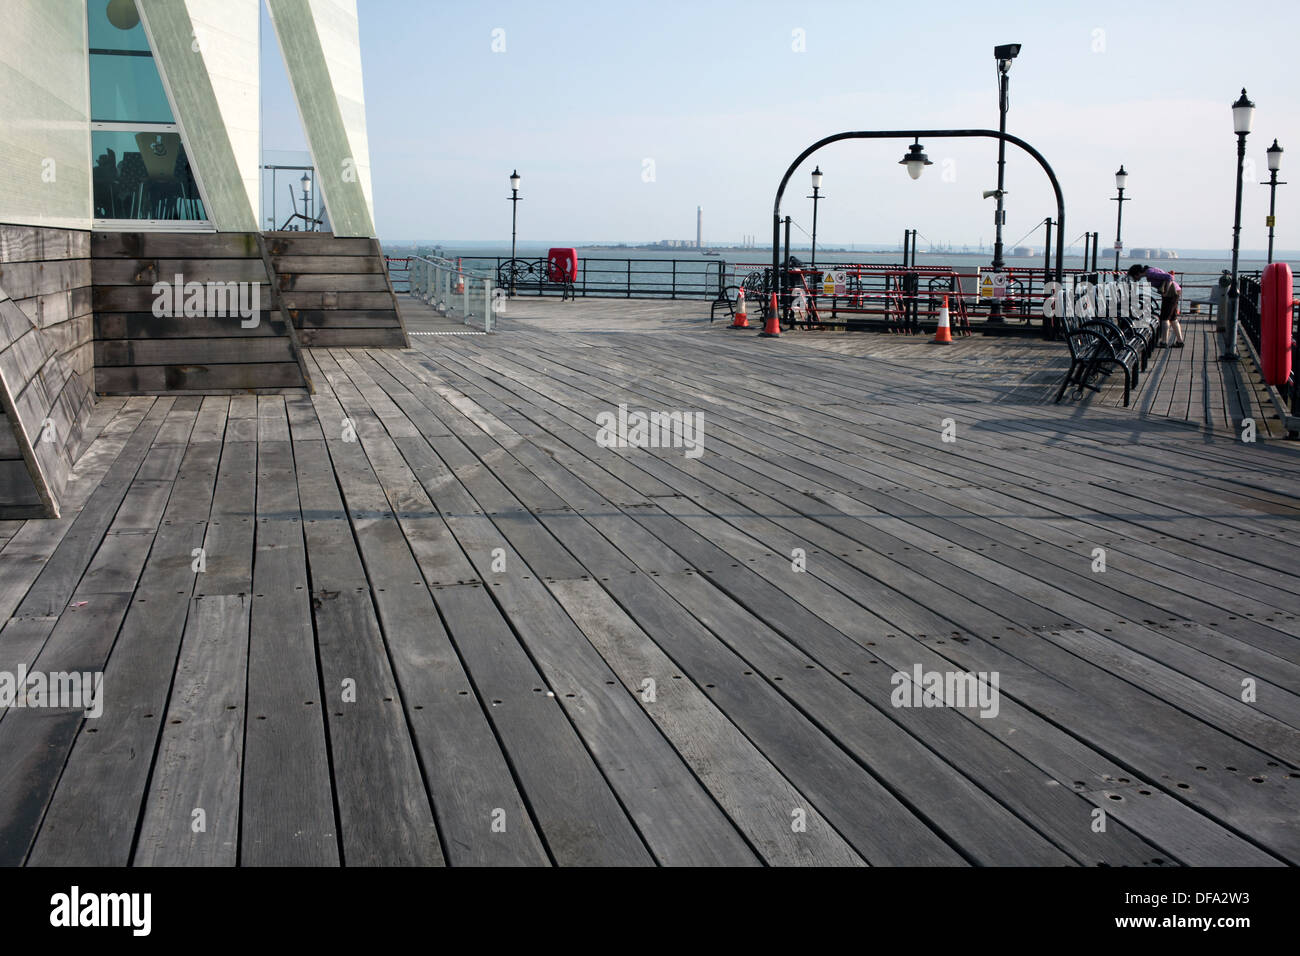 Southend on Sea Pier - Westcliff-on-sea - Southend-on-sea - Sussex - England - UK - Stock Image